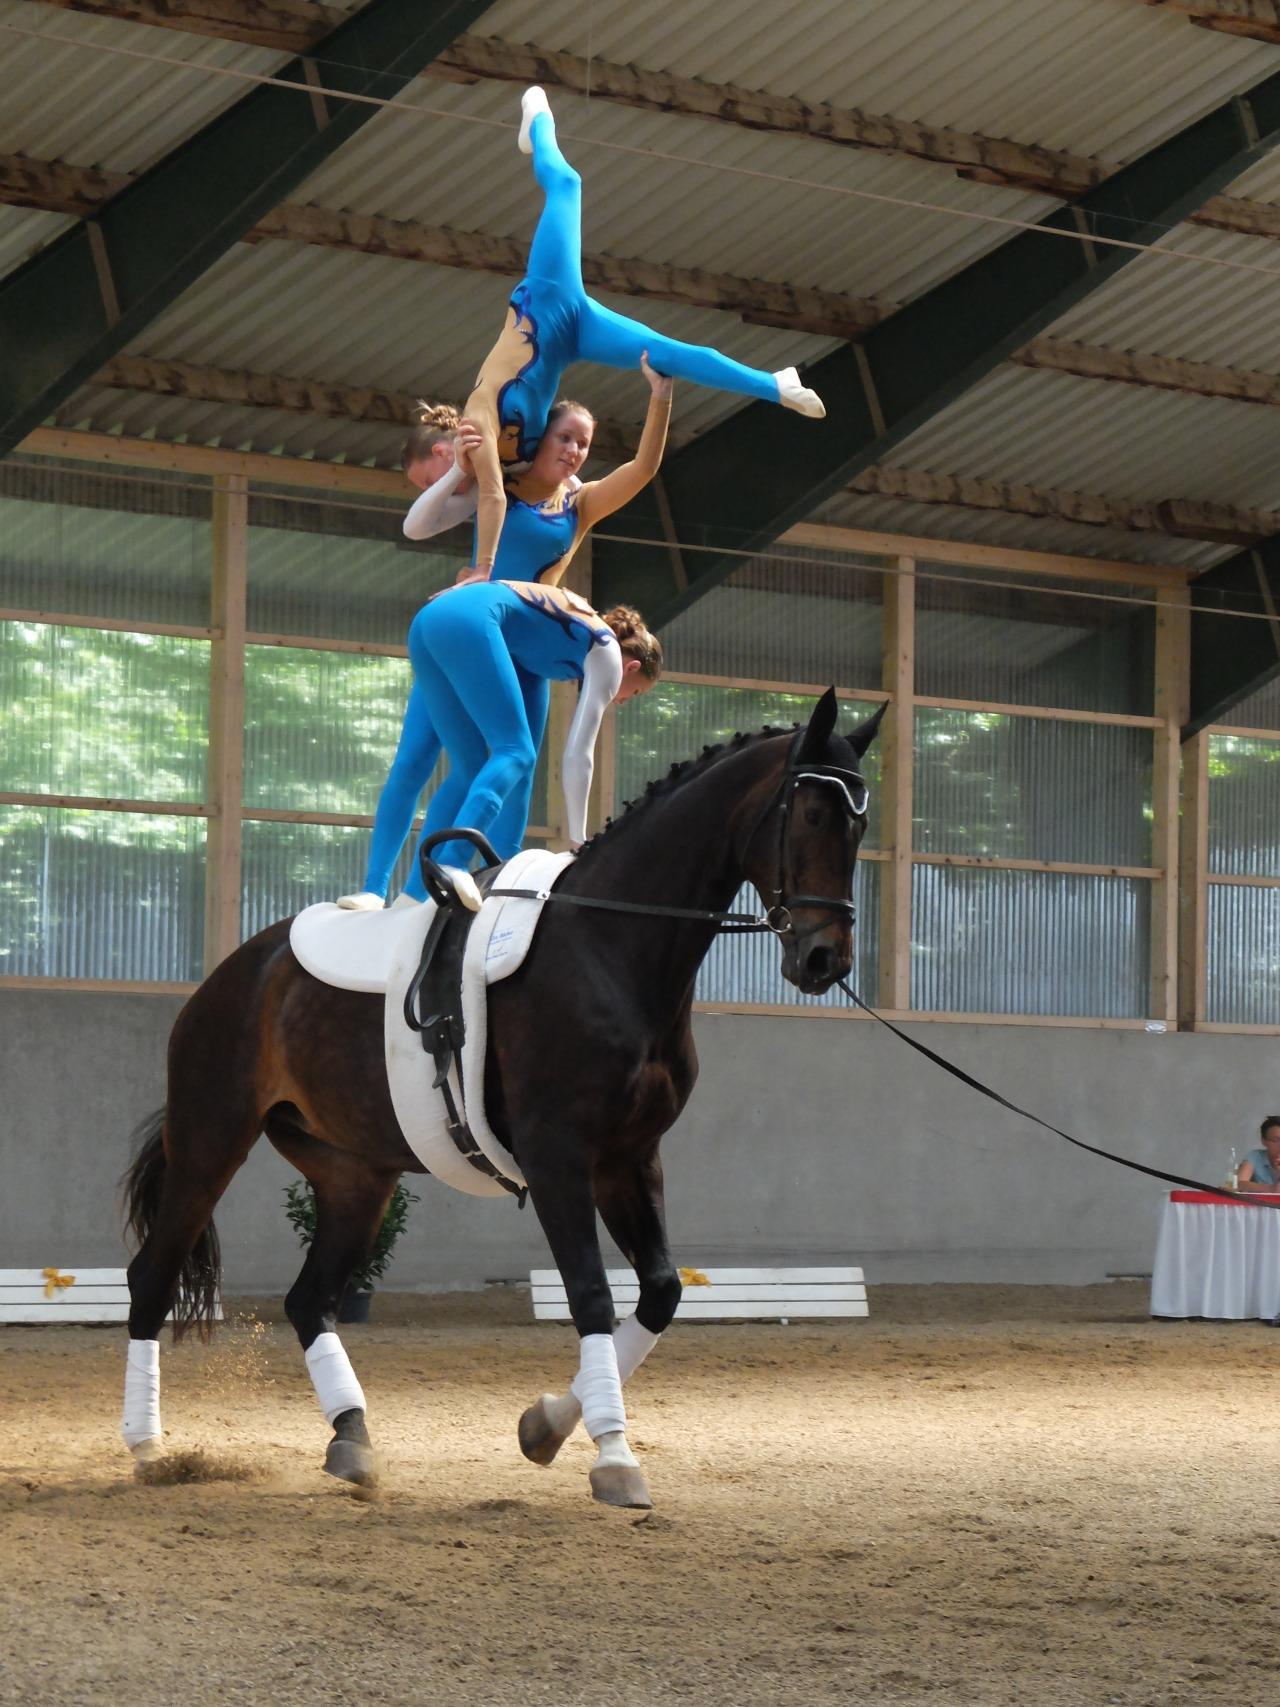 mangia minga - gymnastics on horseback, team RVC Gilching 2